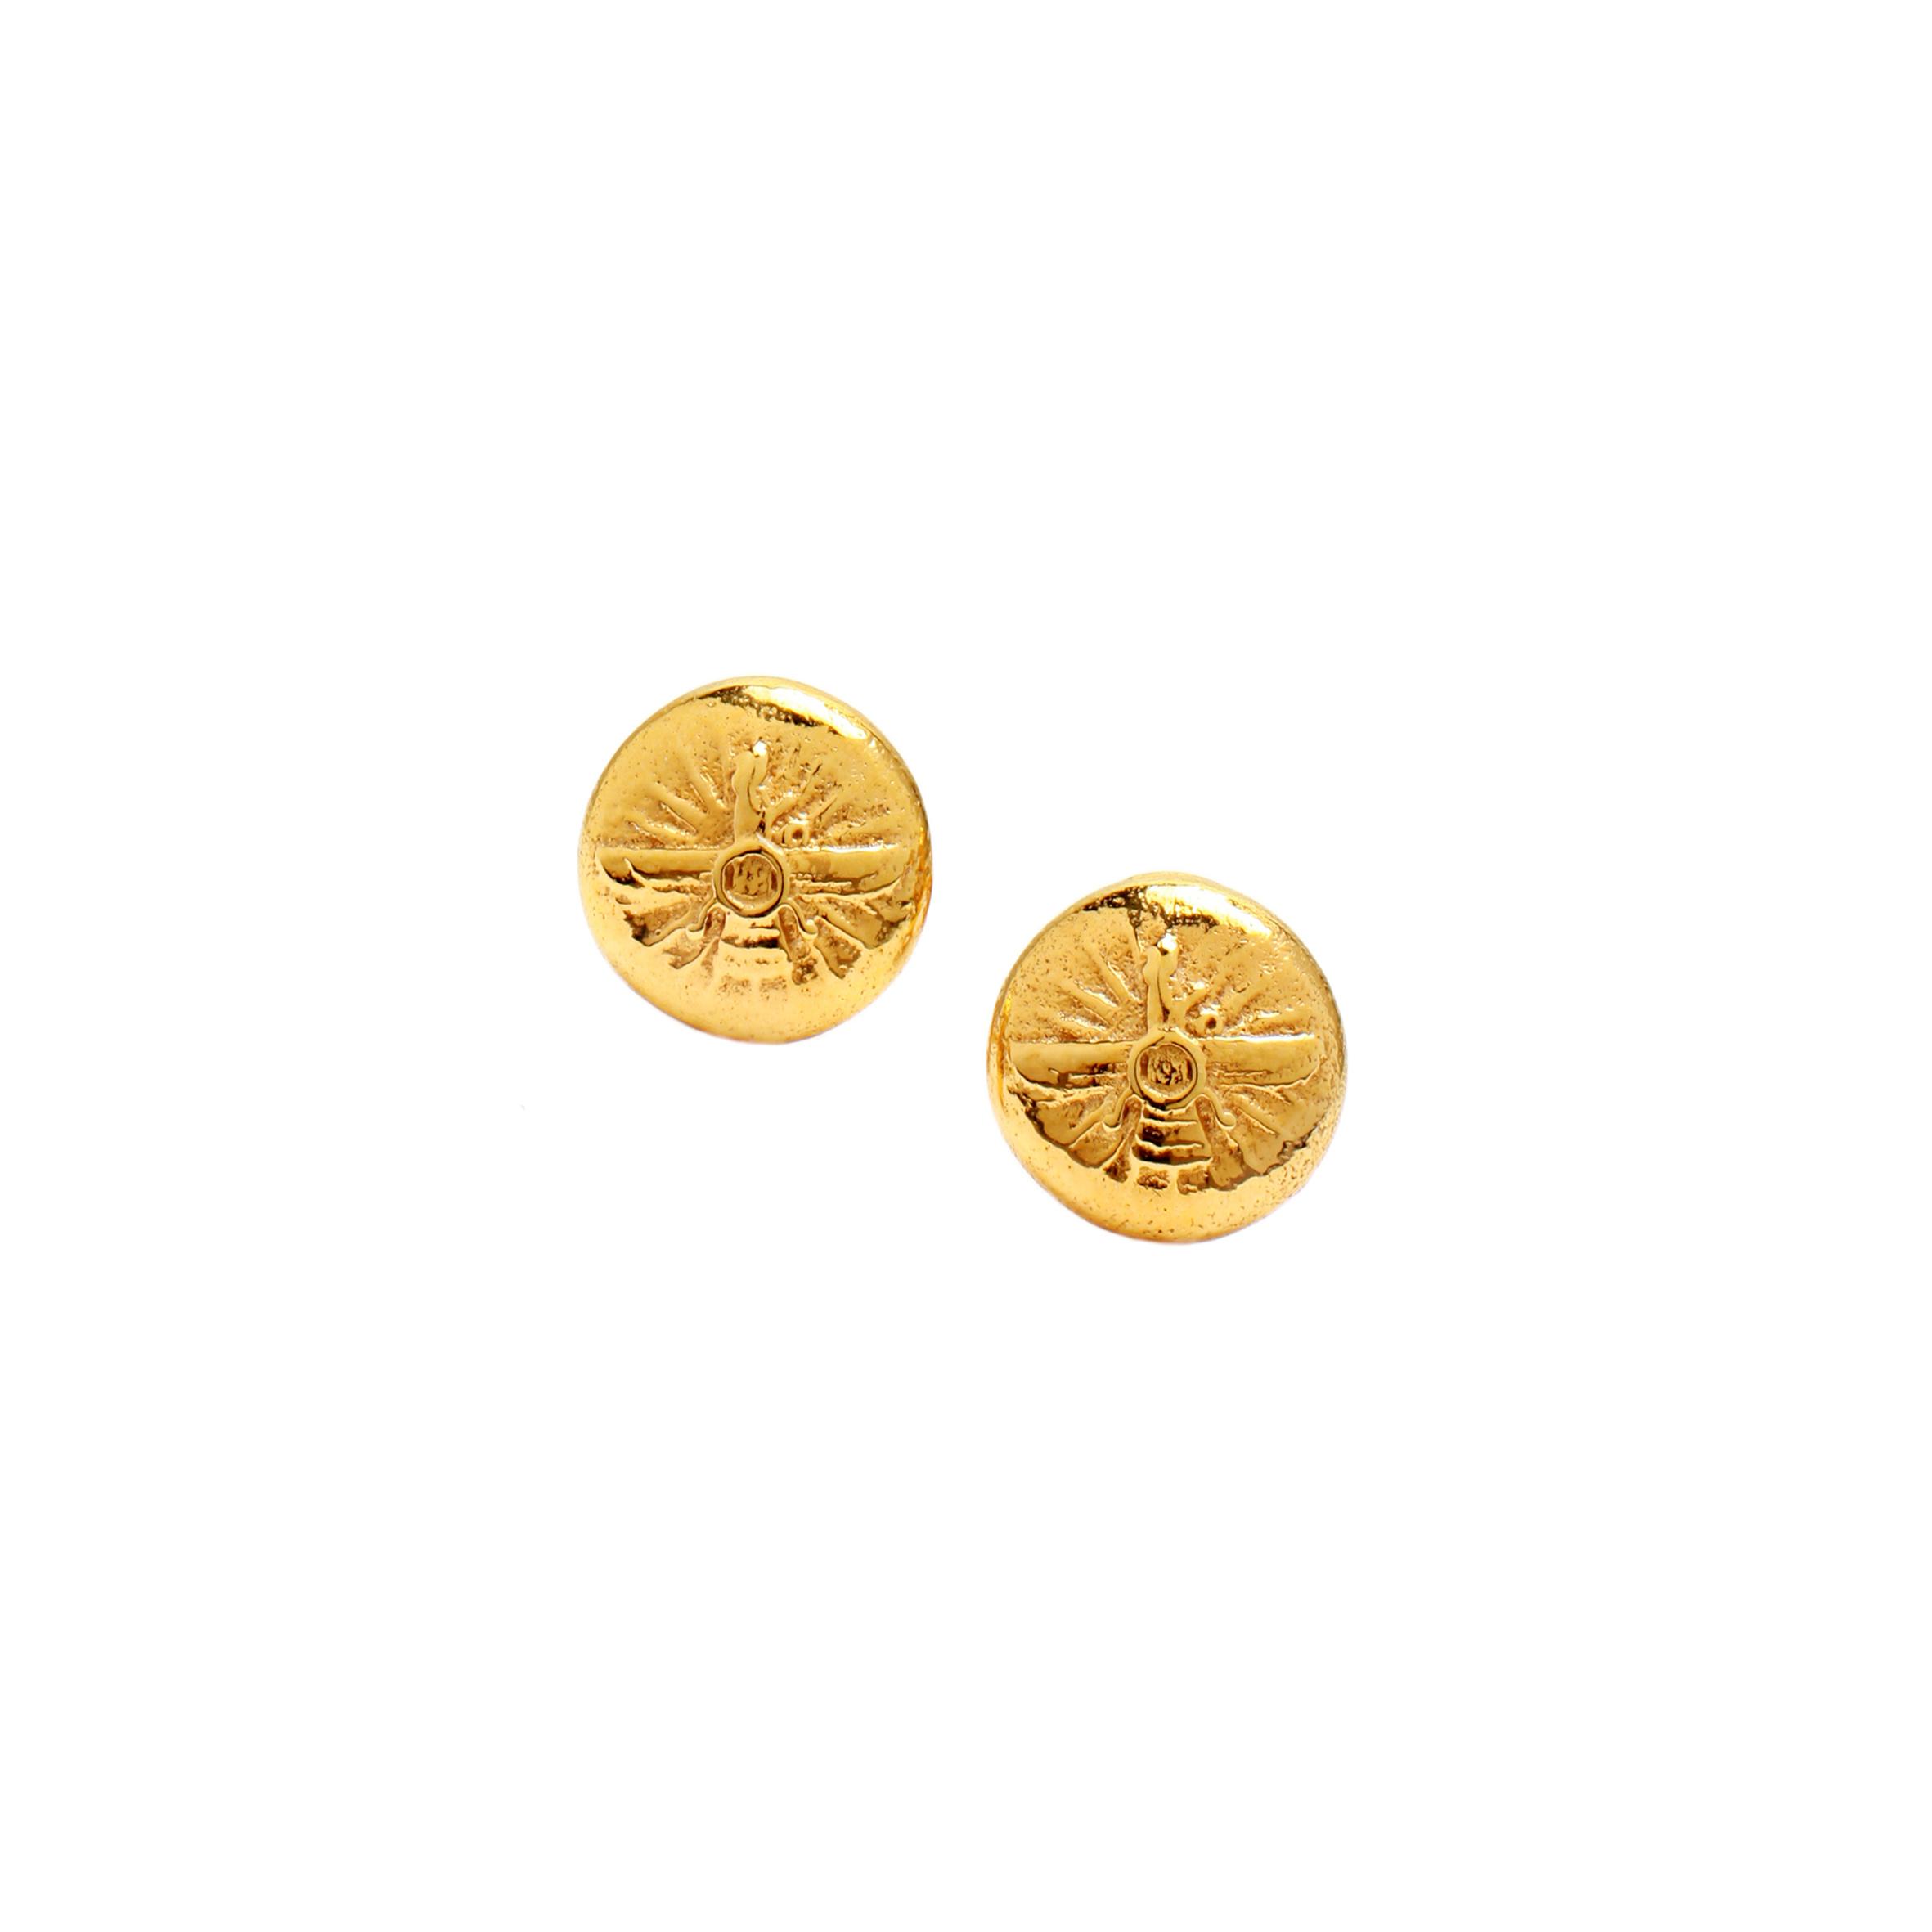 Farvahar buton earring1